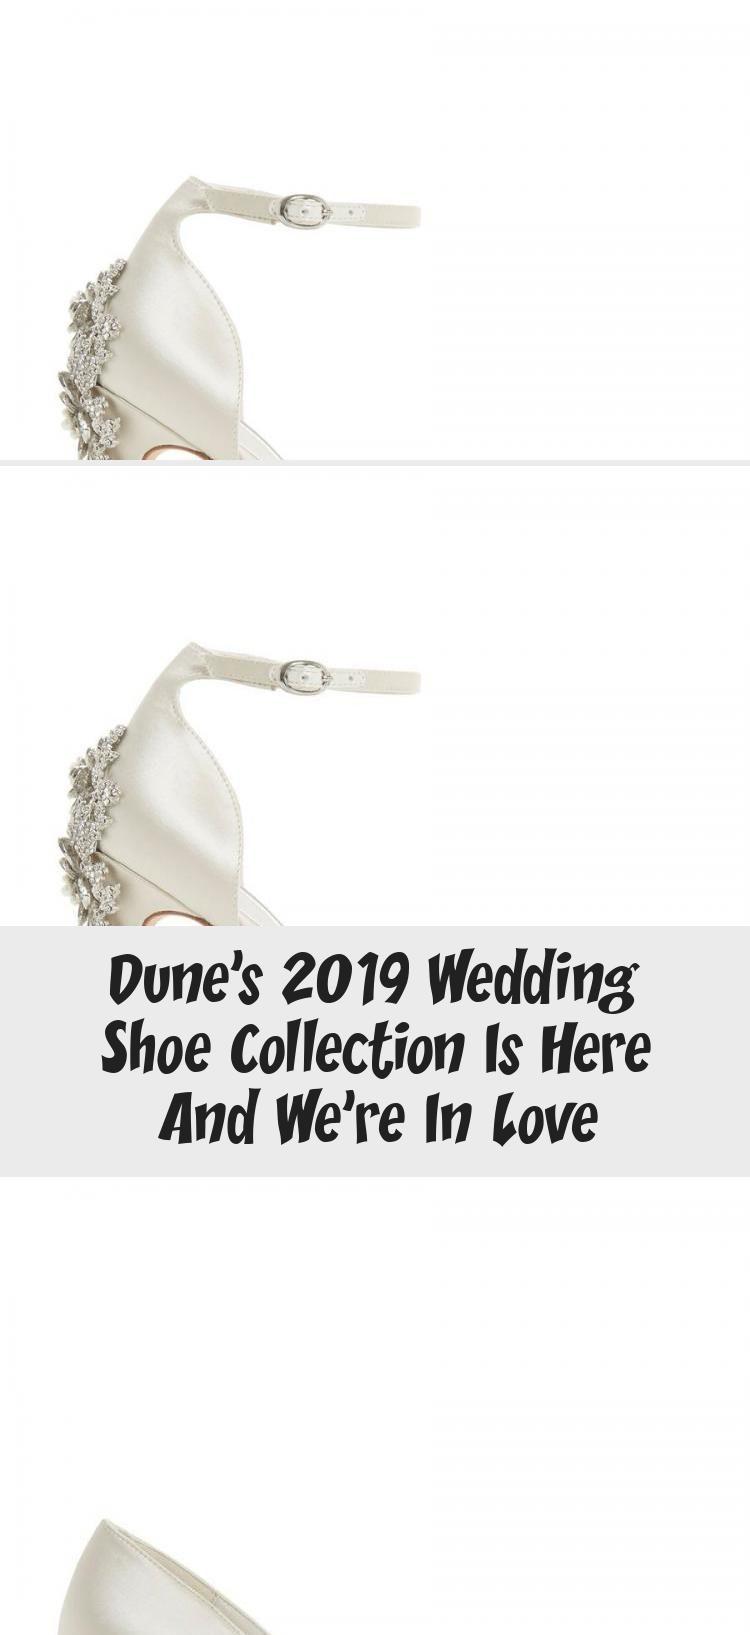 alternative wedding shoes Dune high street wedding alternative wedding shoes Dune high street wedding